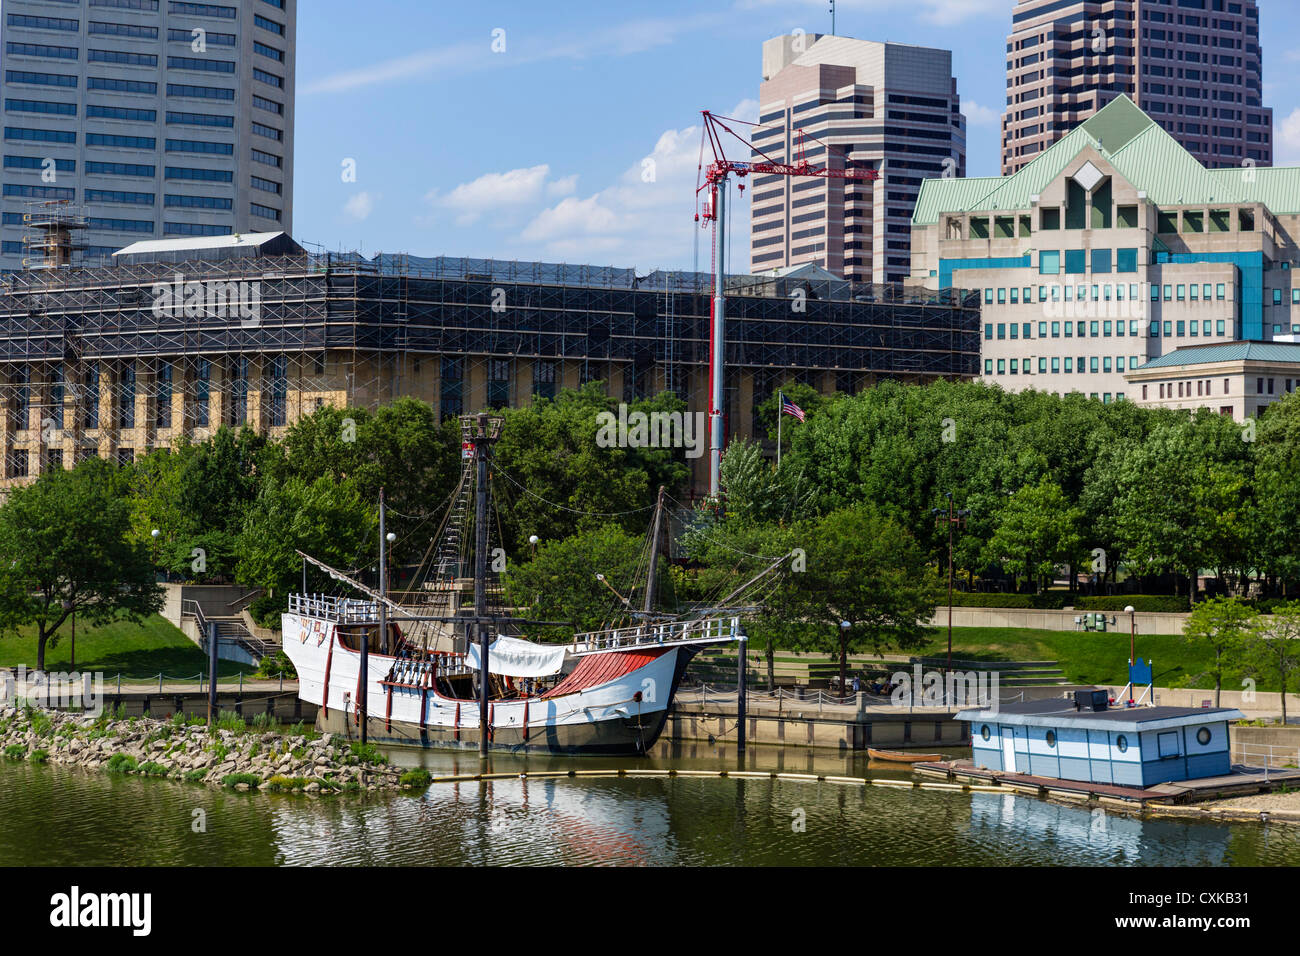 Replica of Christopher Columbus's ship the 'Santa Maria' on the Scioto River, Columbus, Ohio, USA - Stock Image